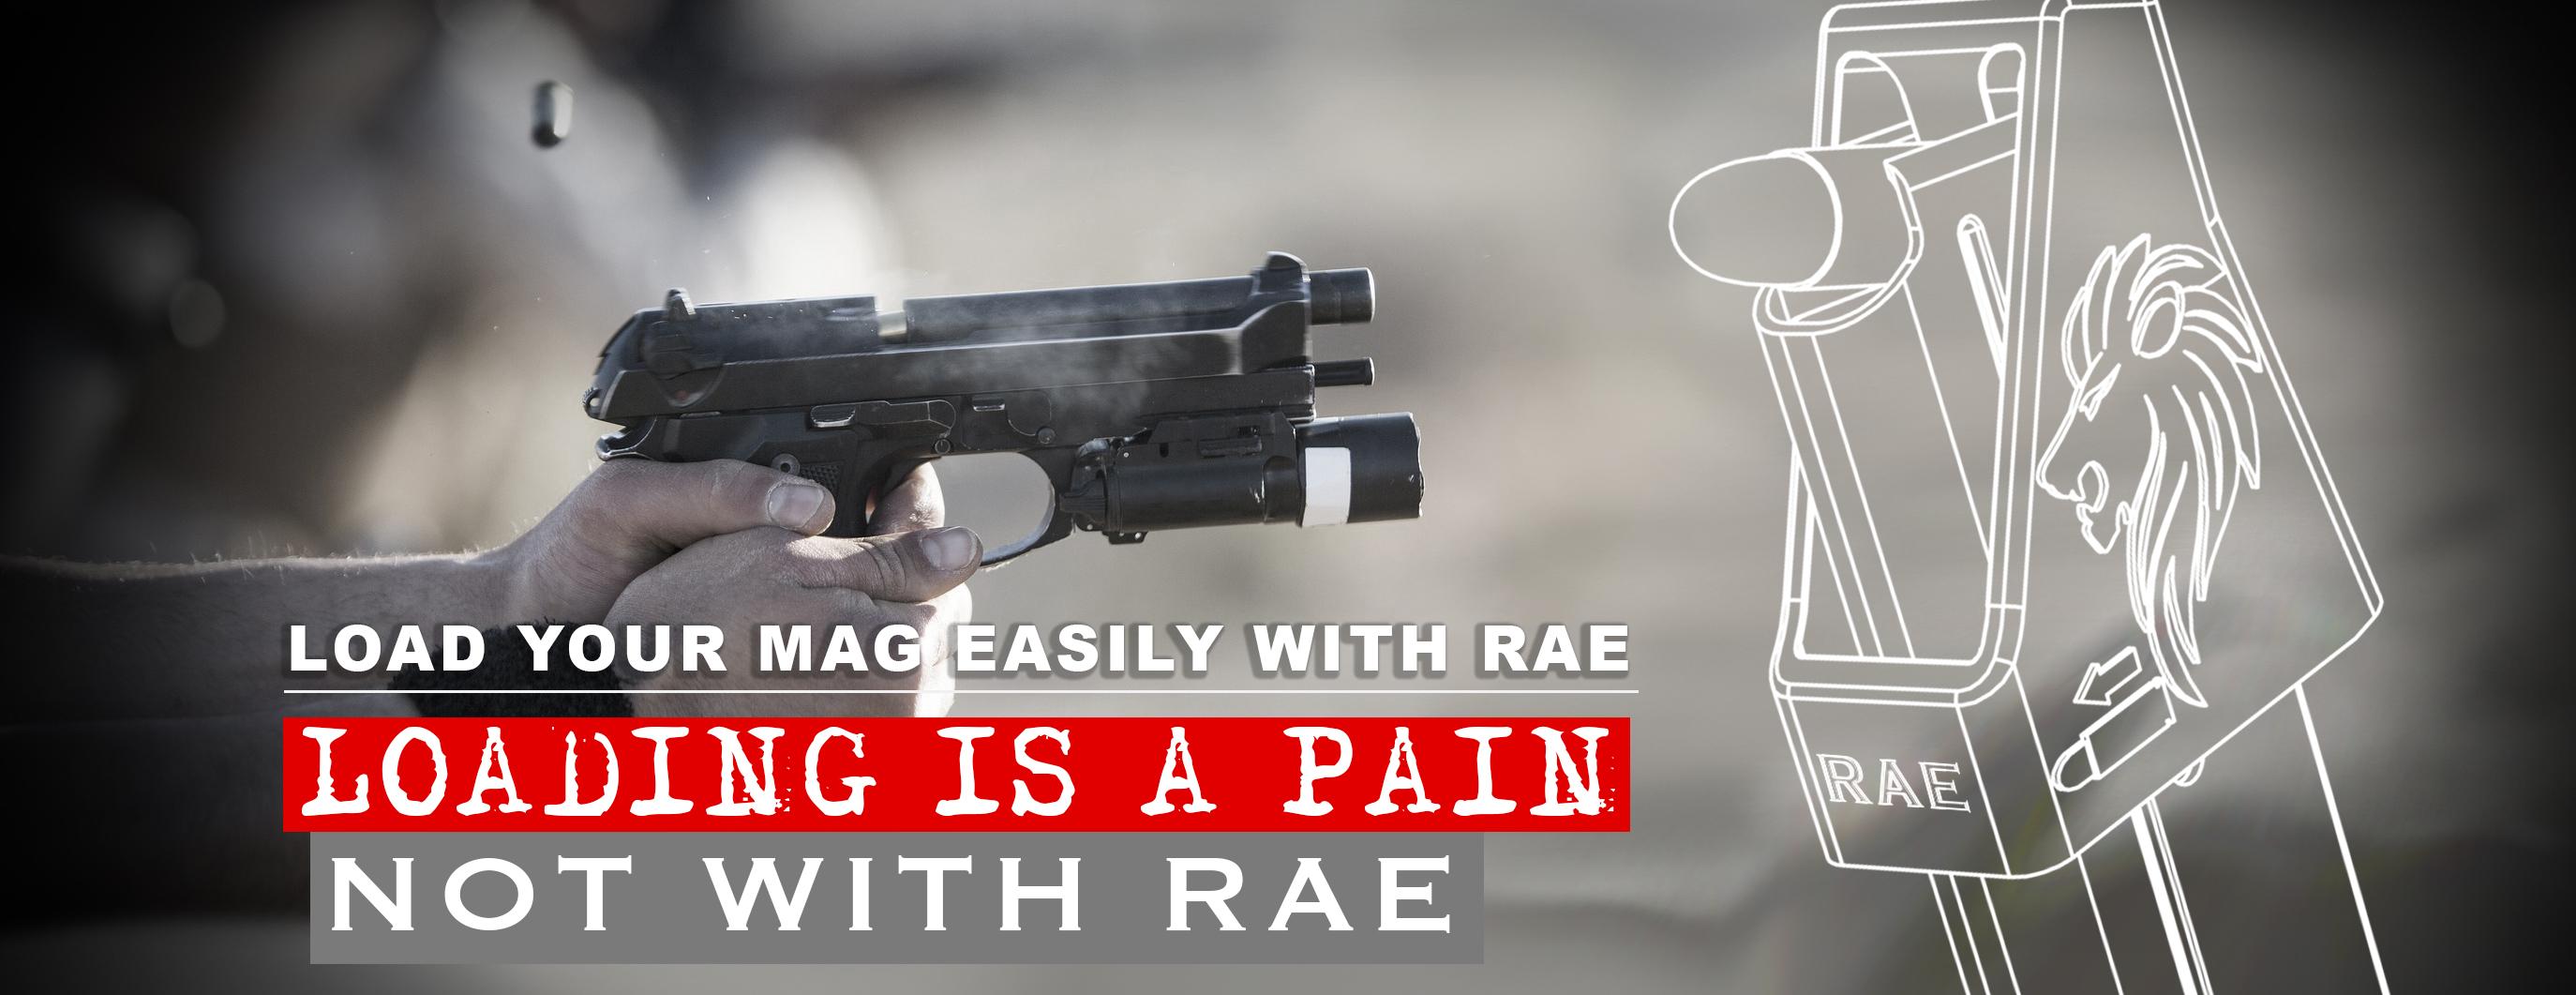 pistol Rae